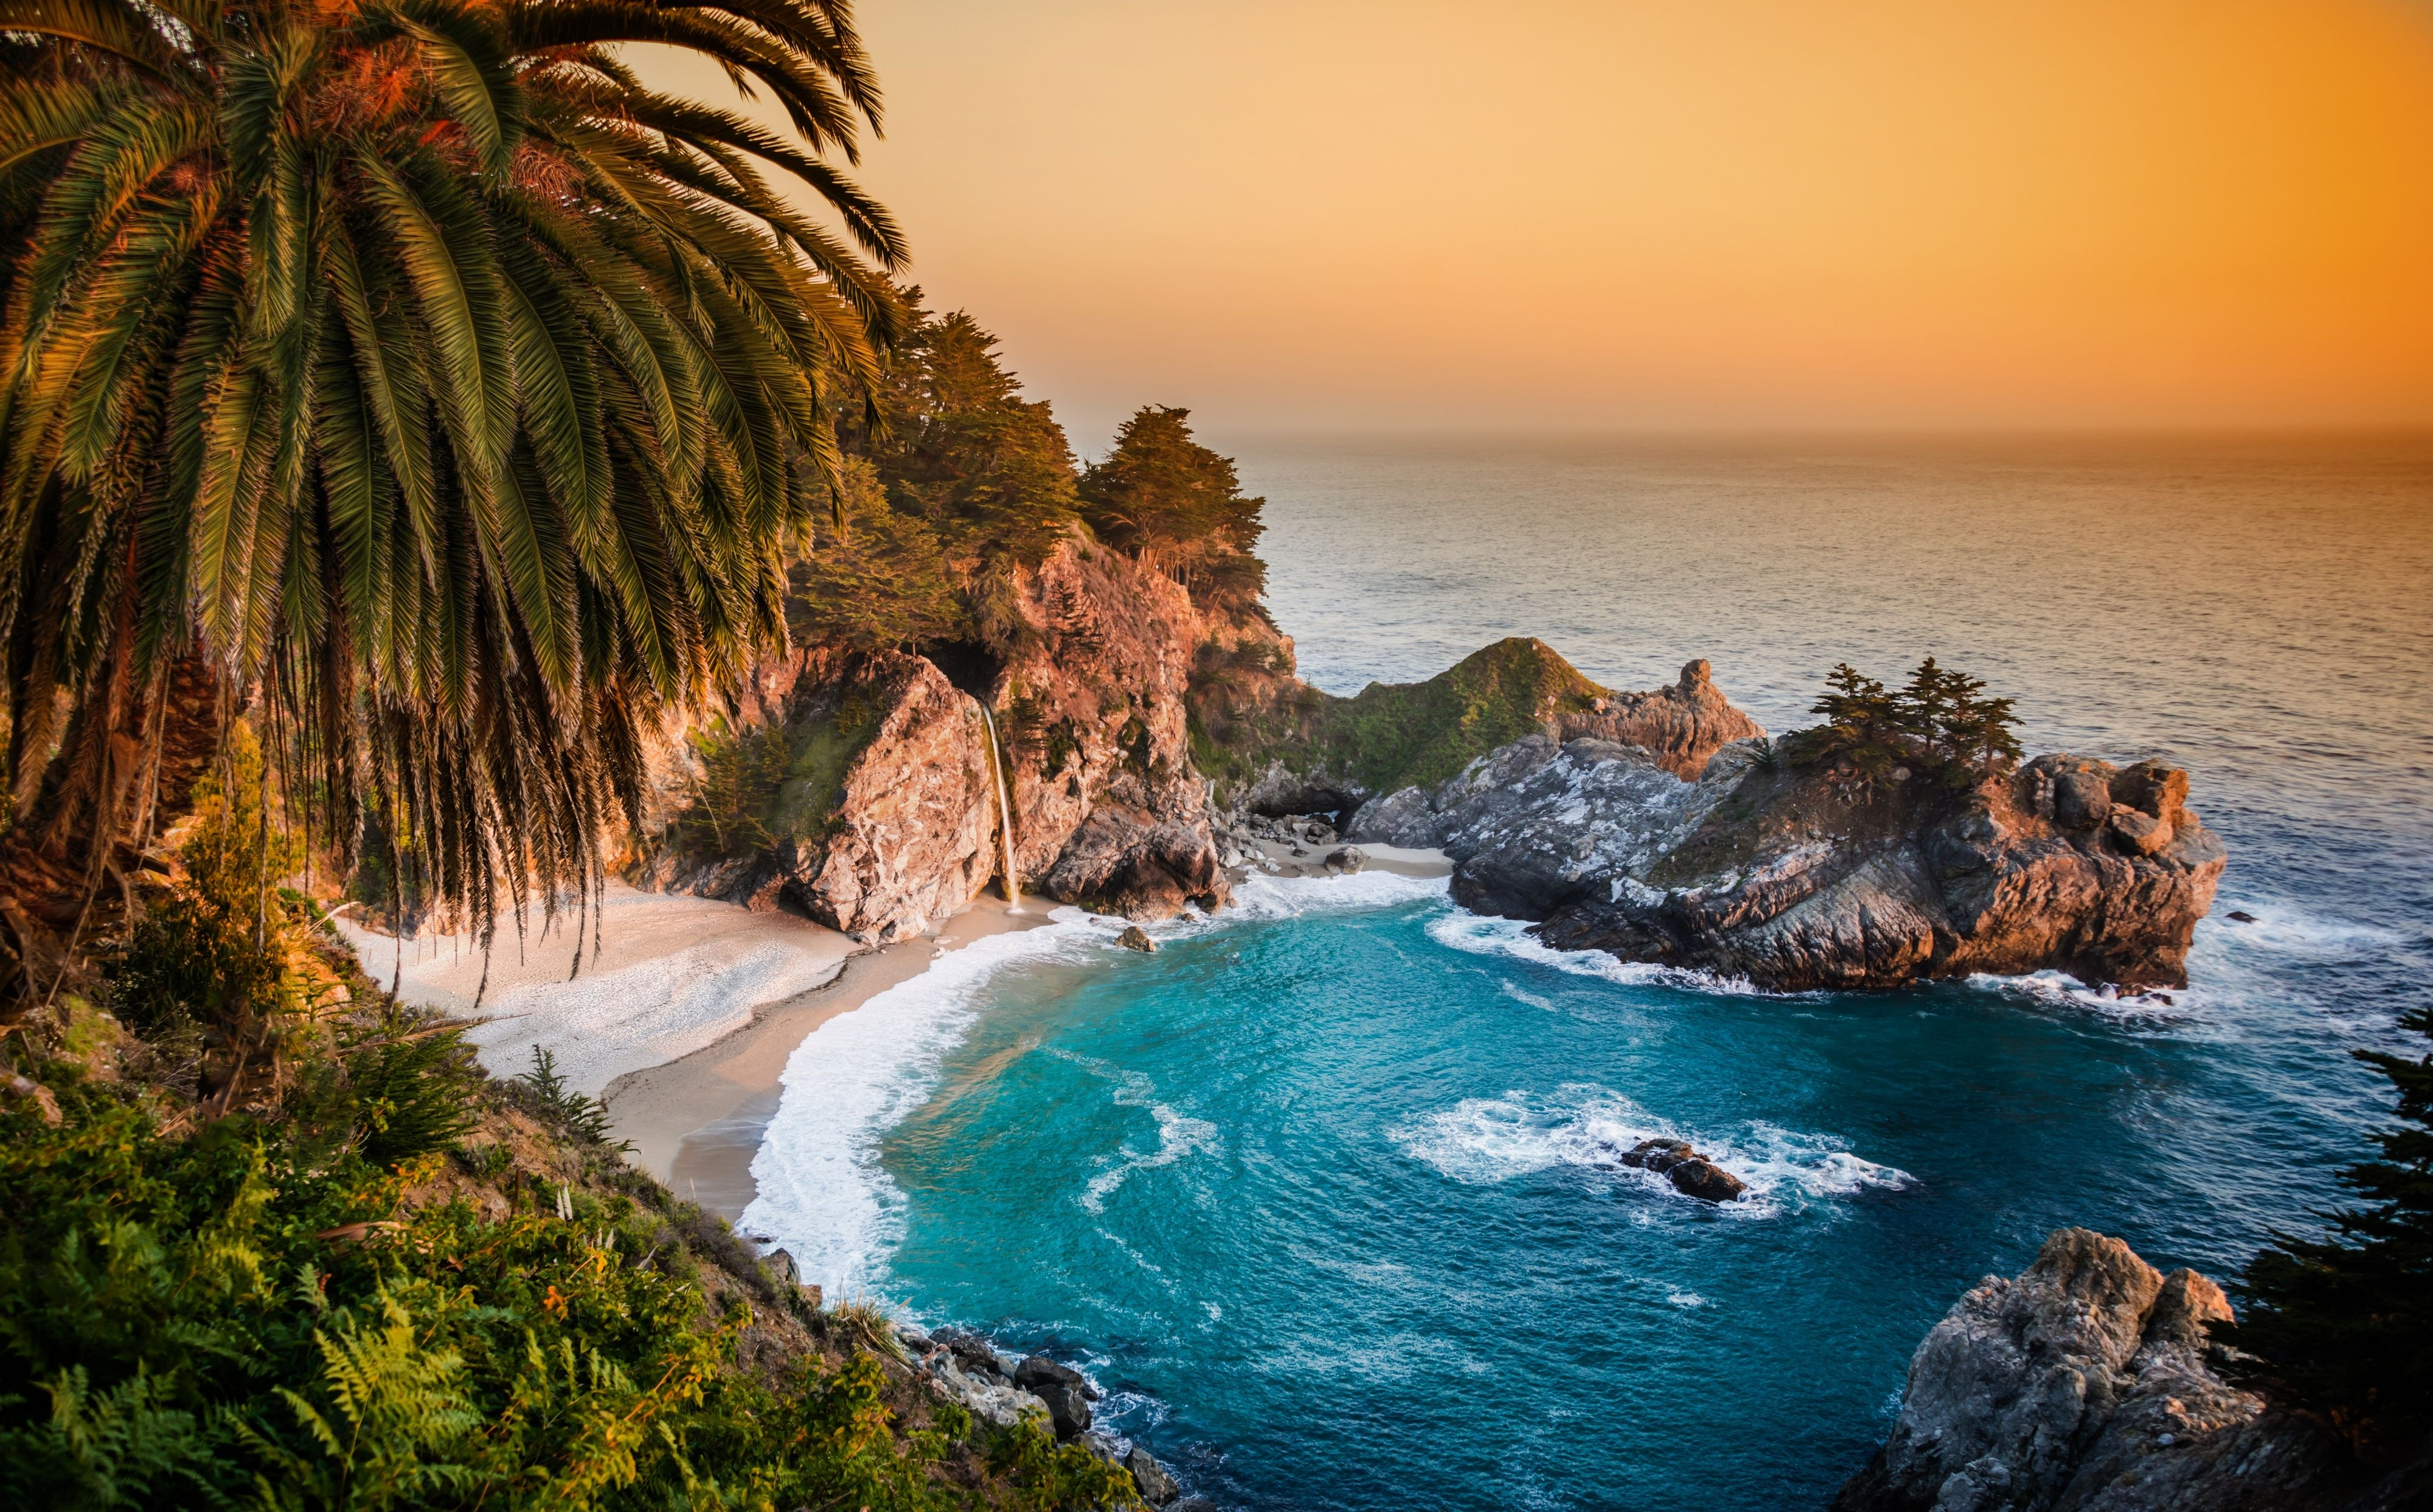 California Pacific Ocean waterfall wallpaper 4000x2486 132629 4000x2486